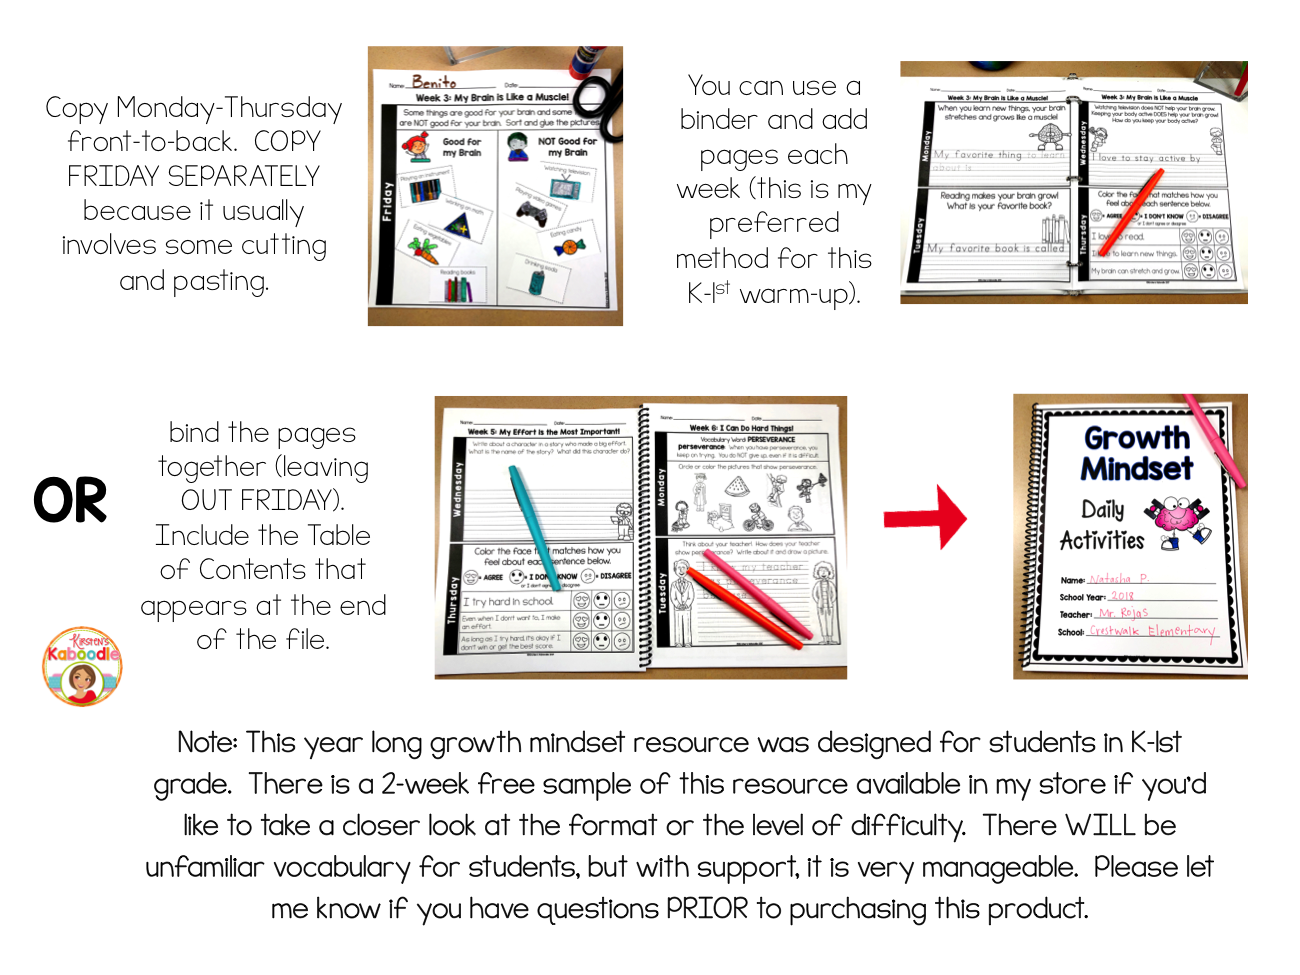 Growth Mindset Activities for Kindergarten and 1st Grade